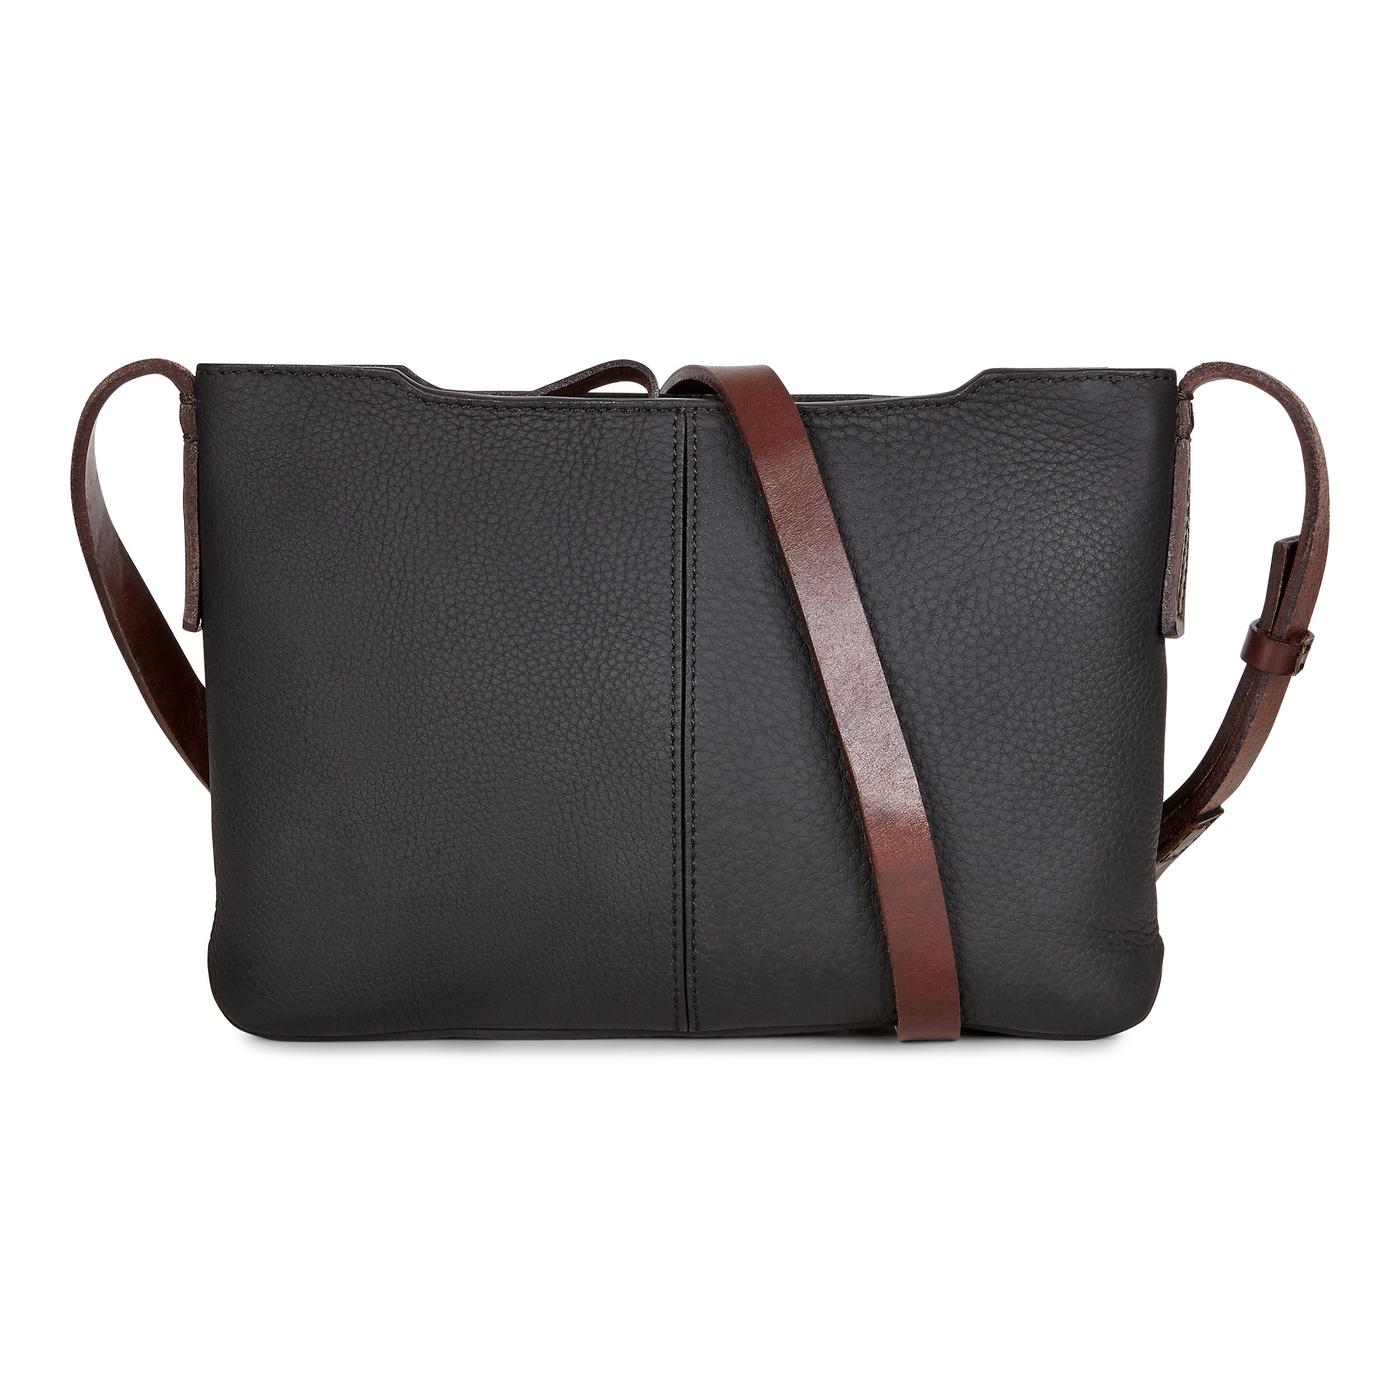 ECCO JILIN Small Crossbody Bag Veg